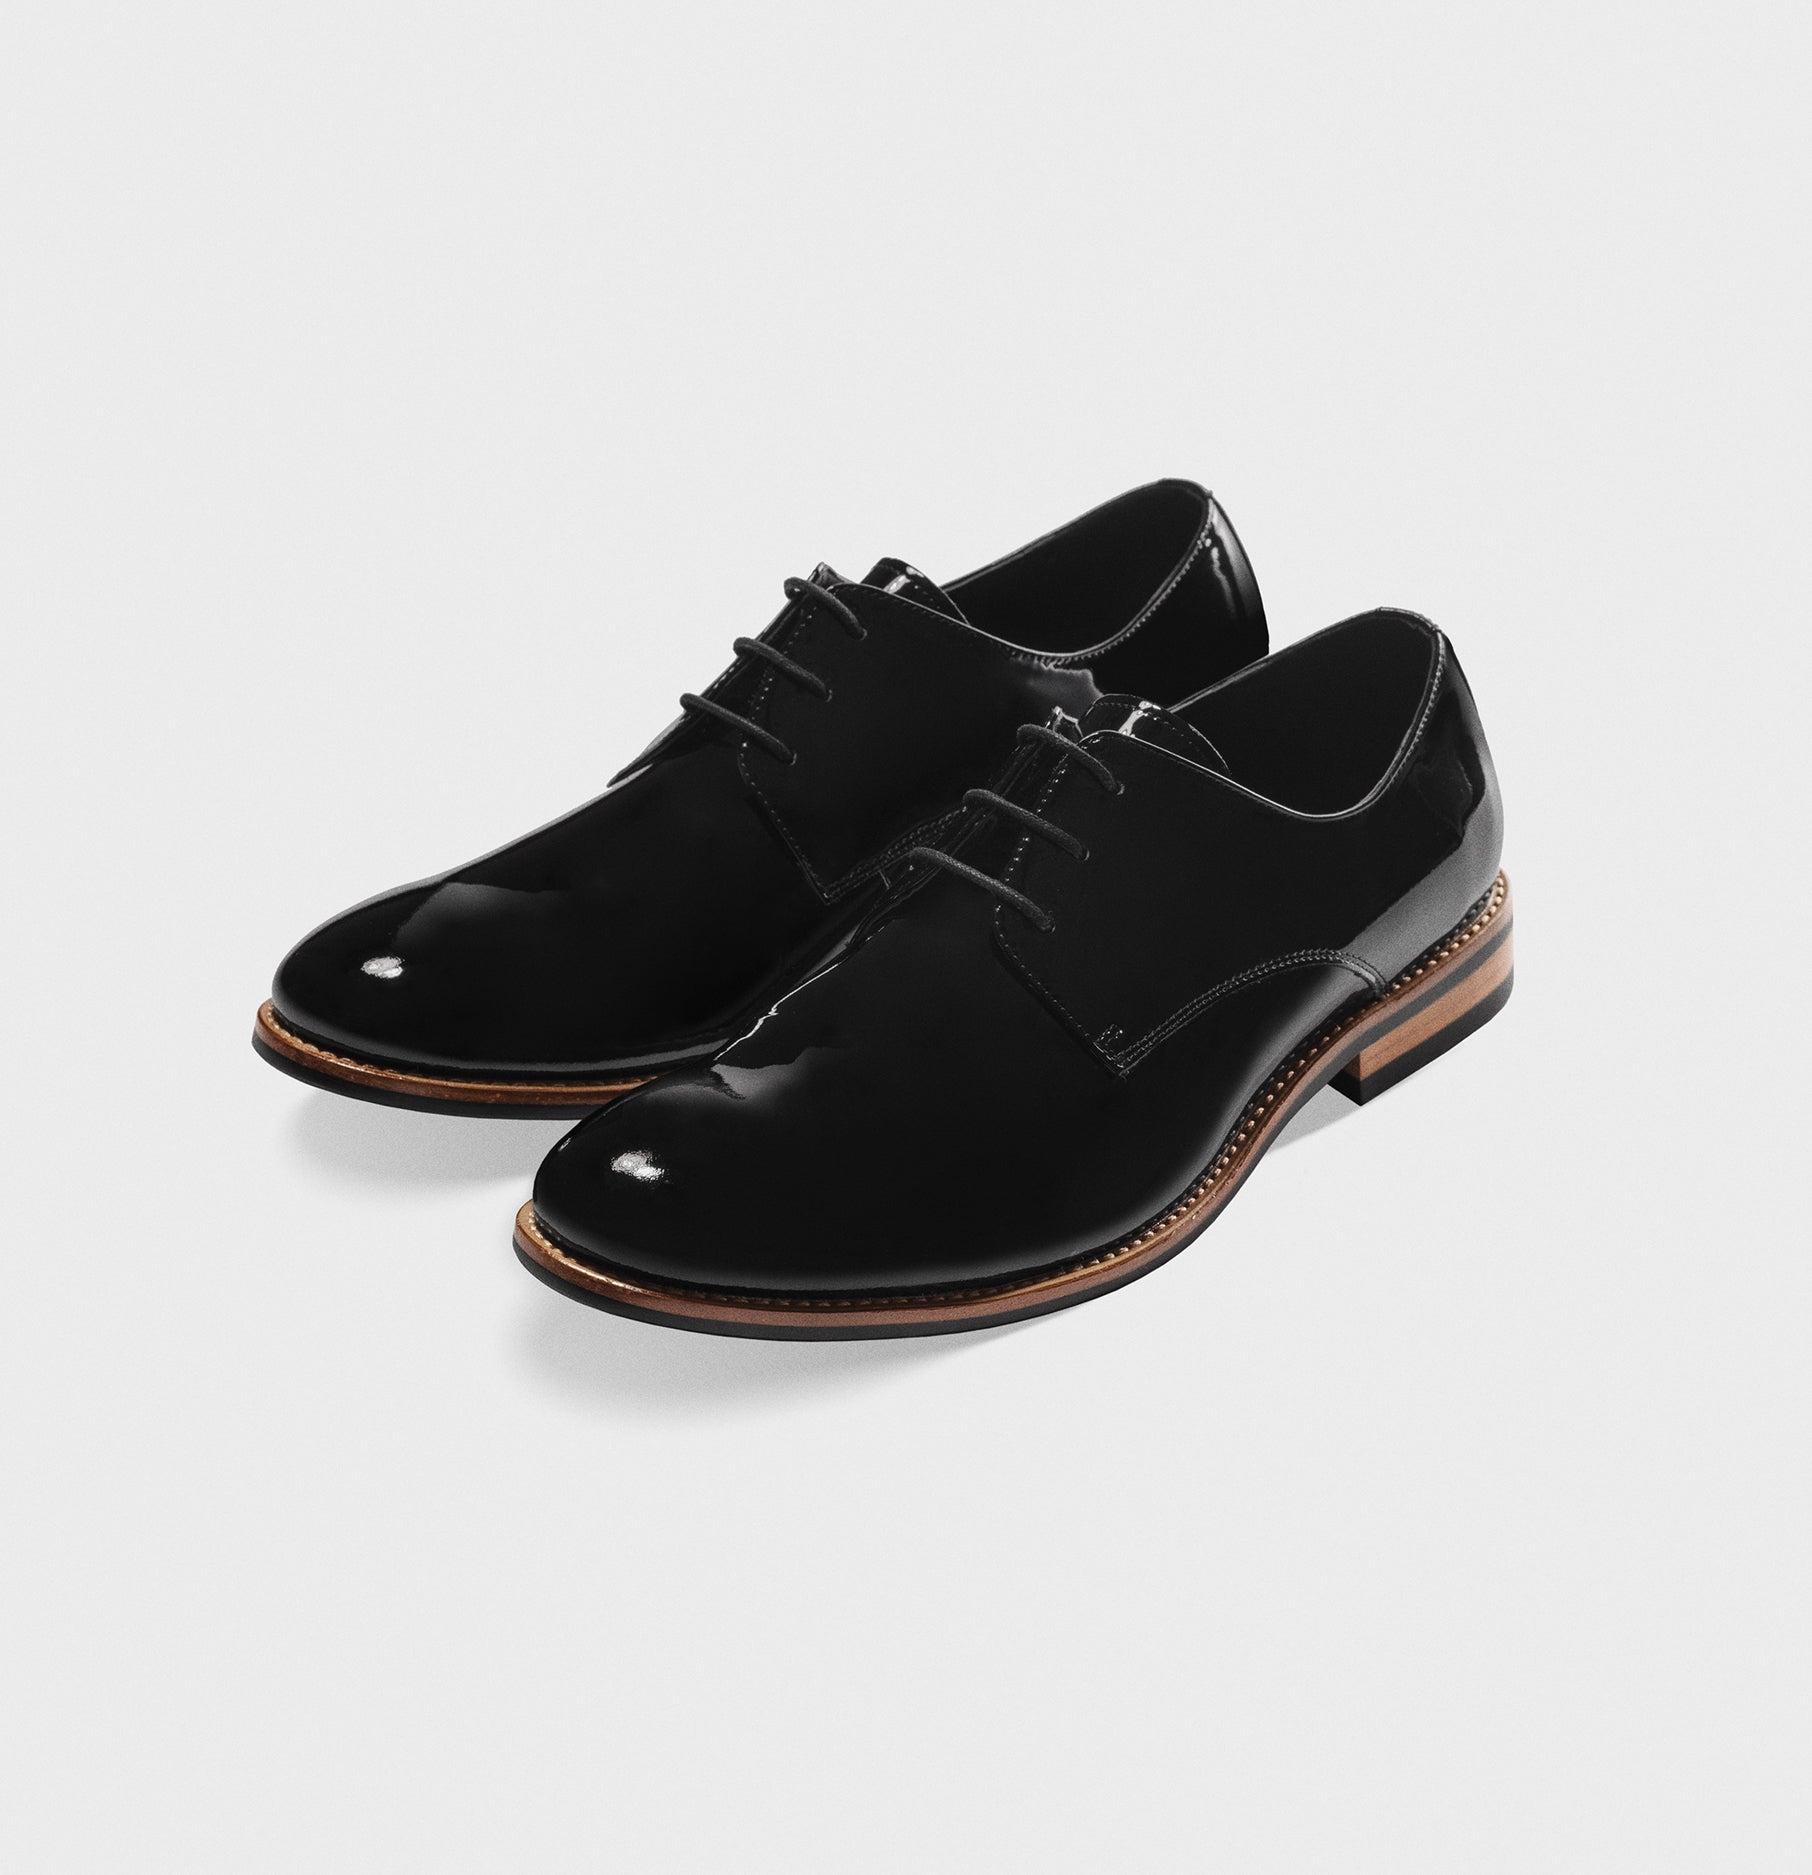 Brown Dress Shoe Rental